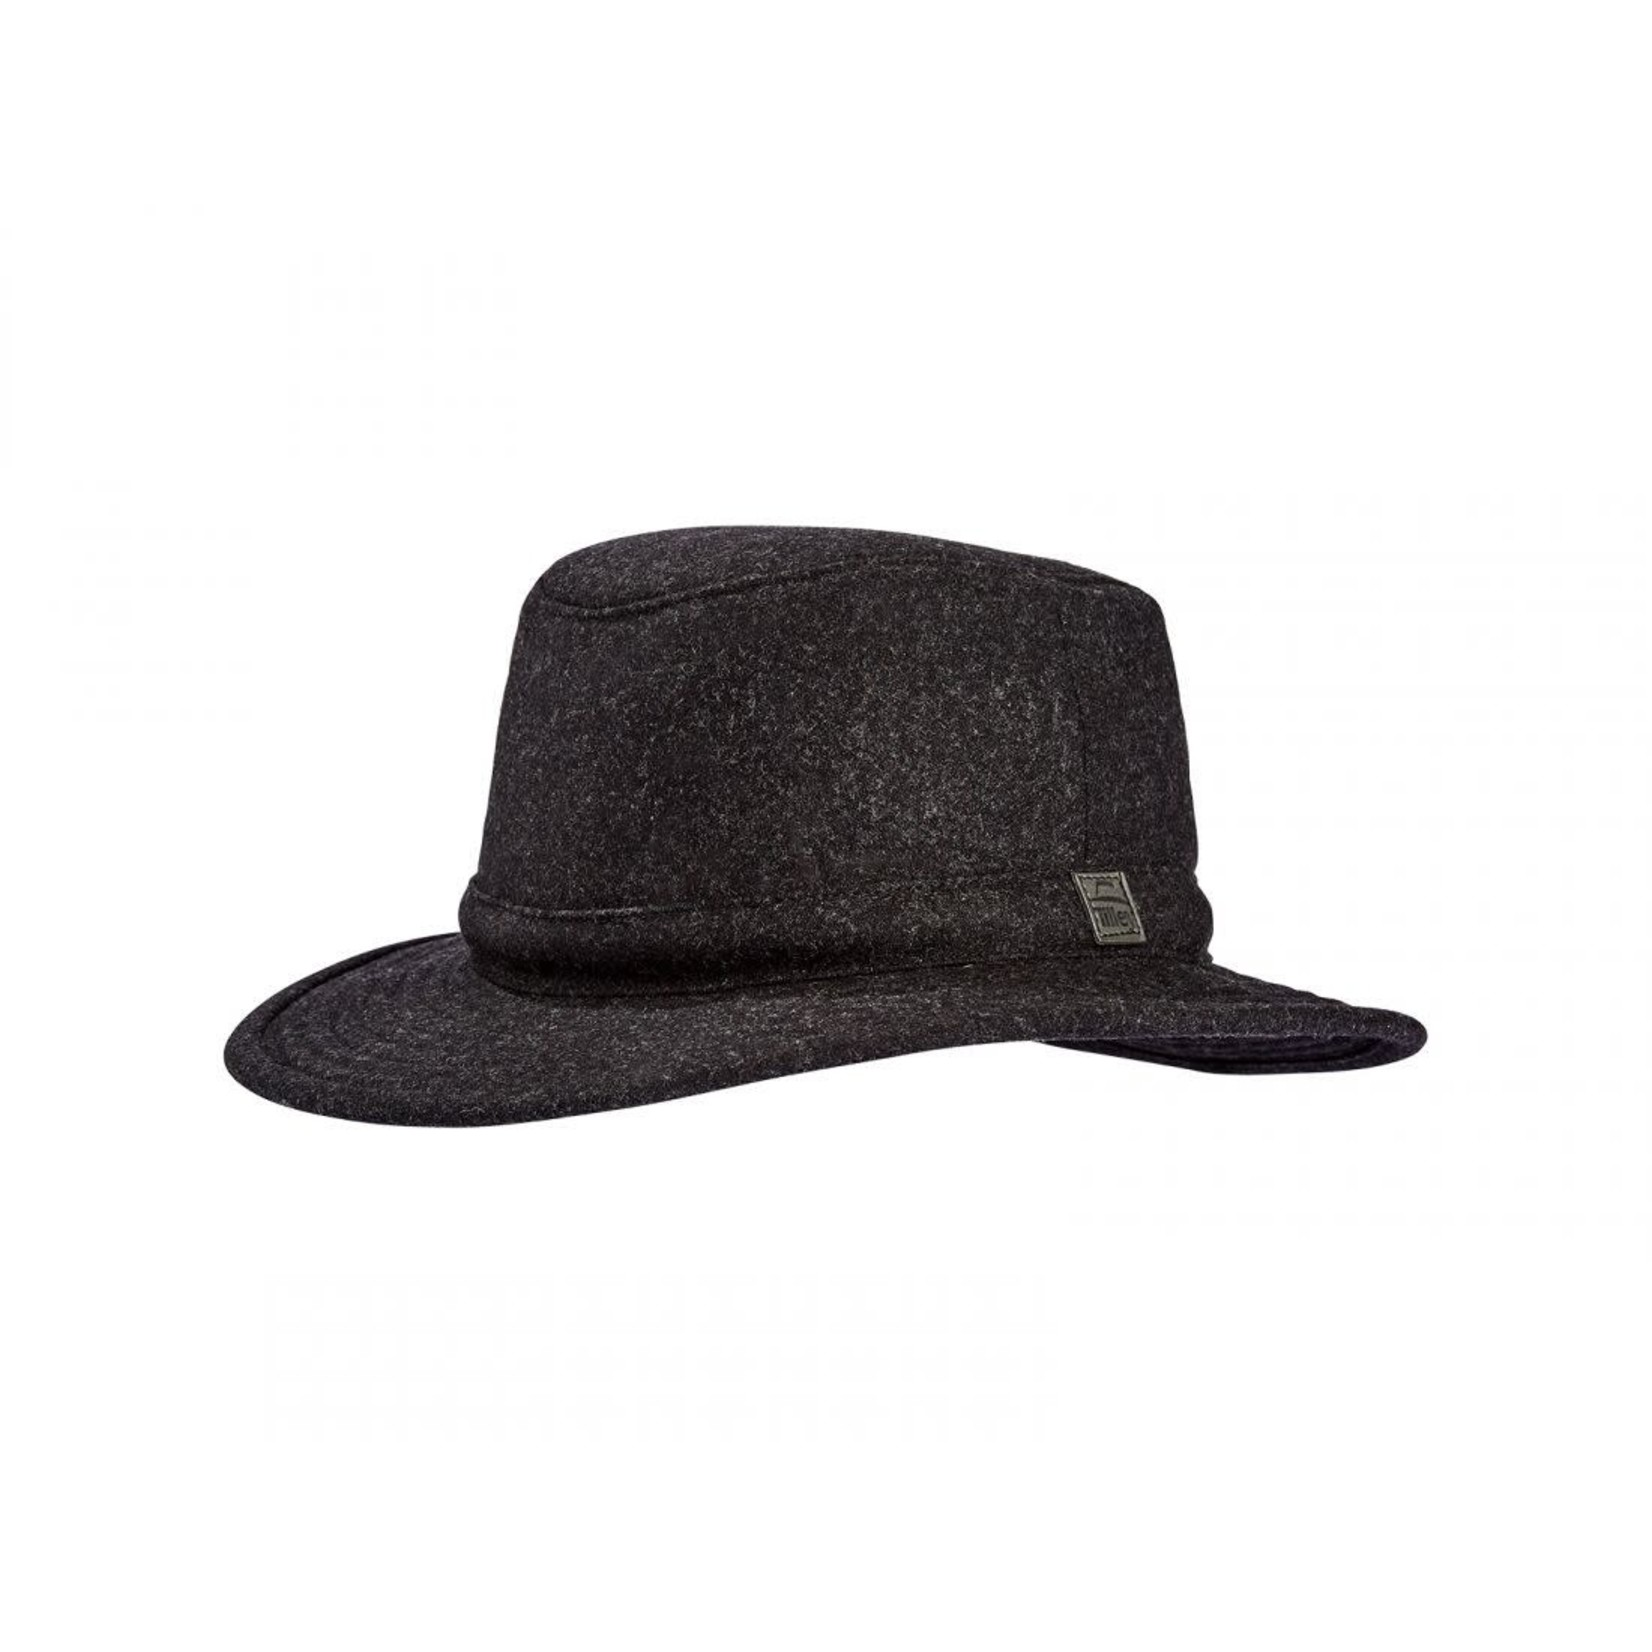 TILLEY ENDURABLES TEC-WOOL HAT